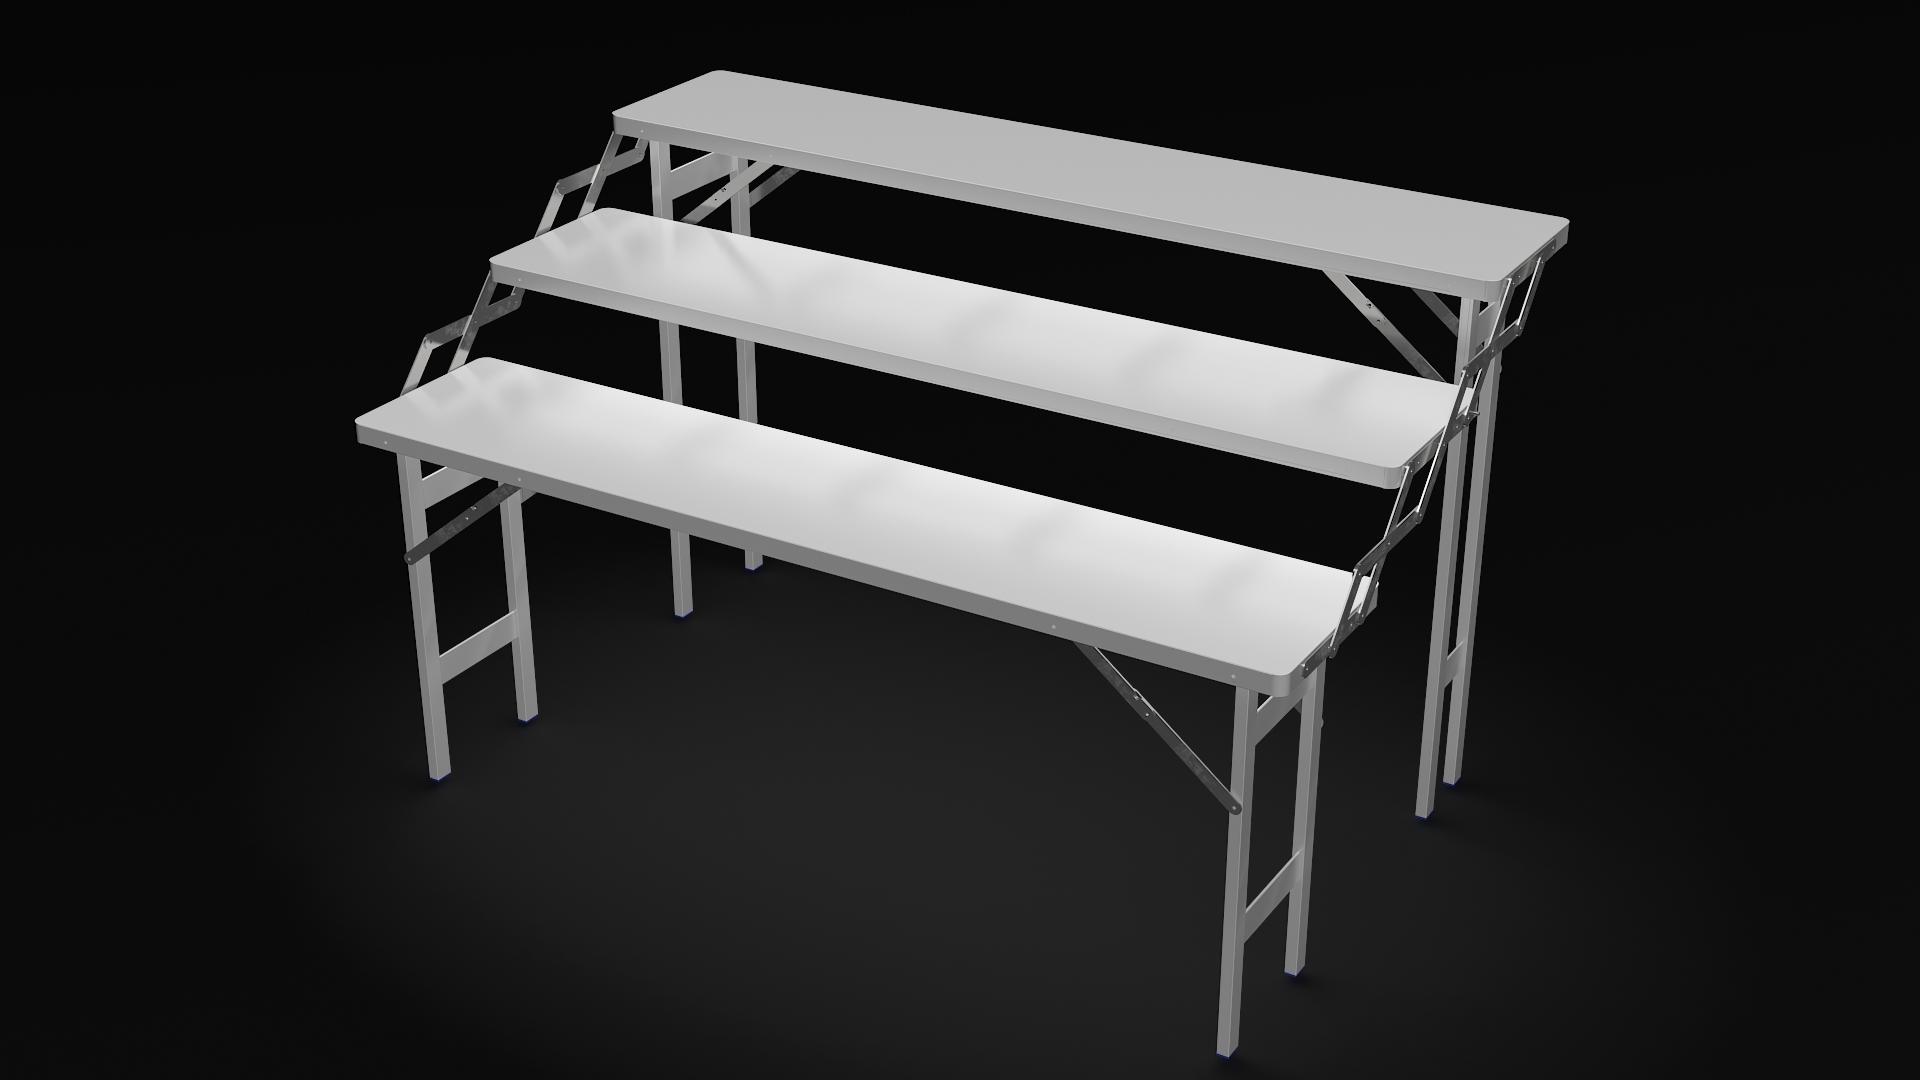 table en alu escalier 3 niv tbl3n wongleon fr fabricant de parasols et materiel forain. Black Bedroom Furniture Sets. Home Design Ideas